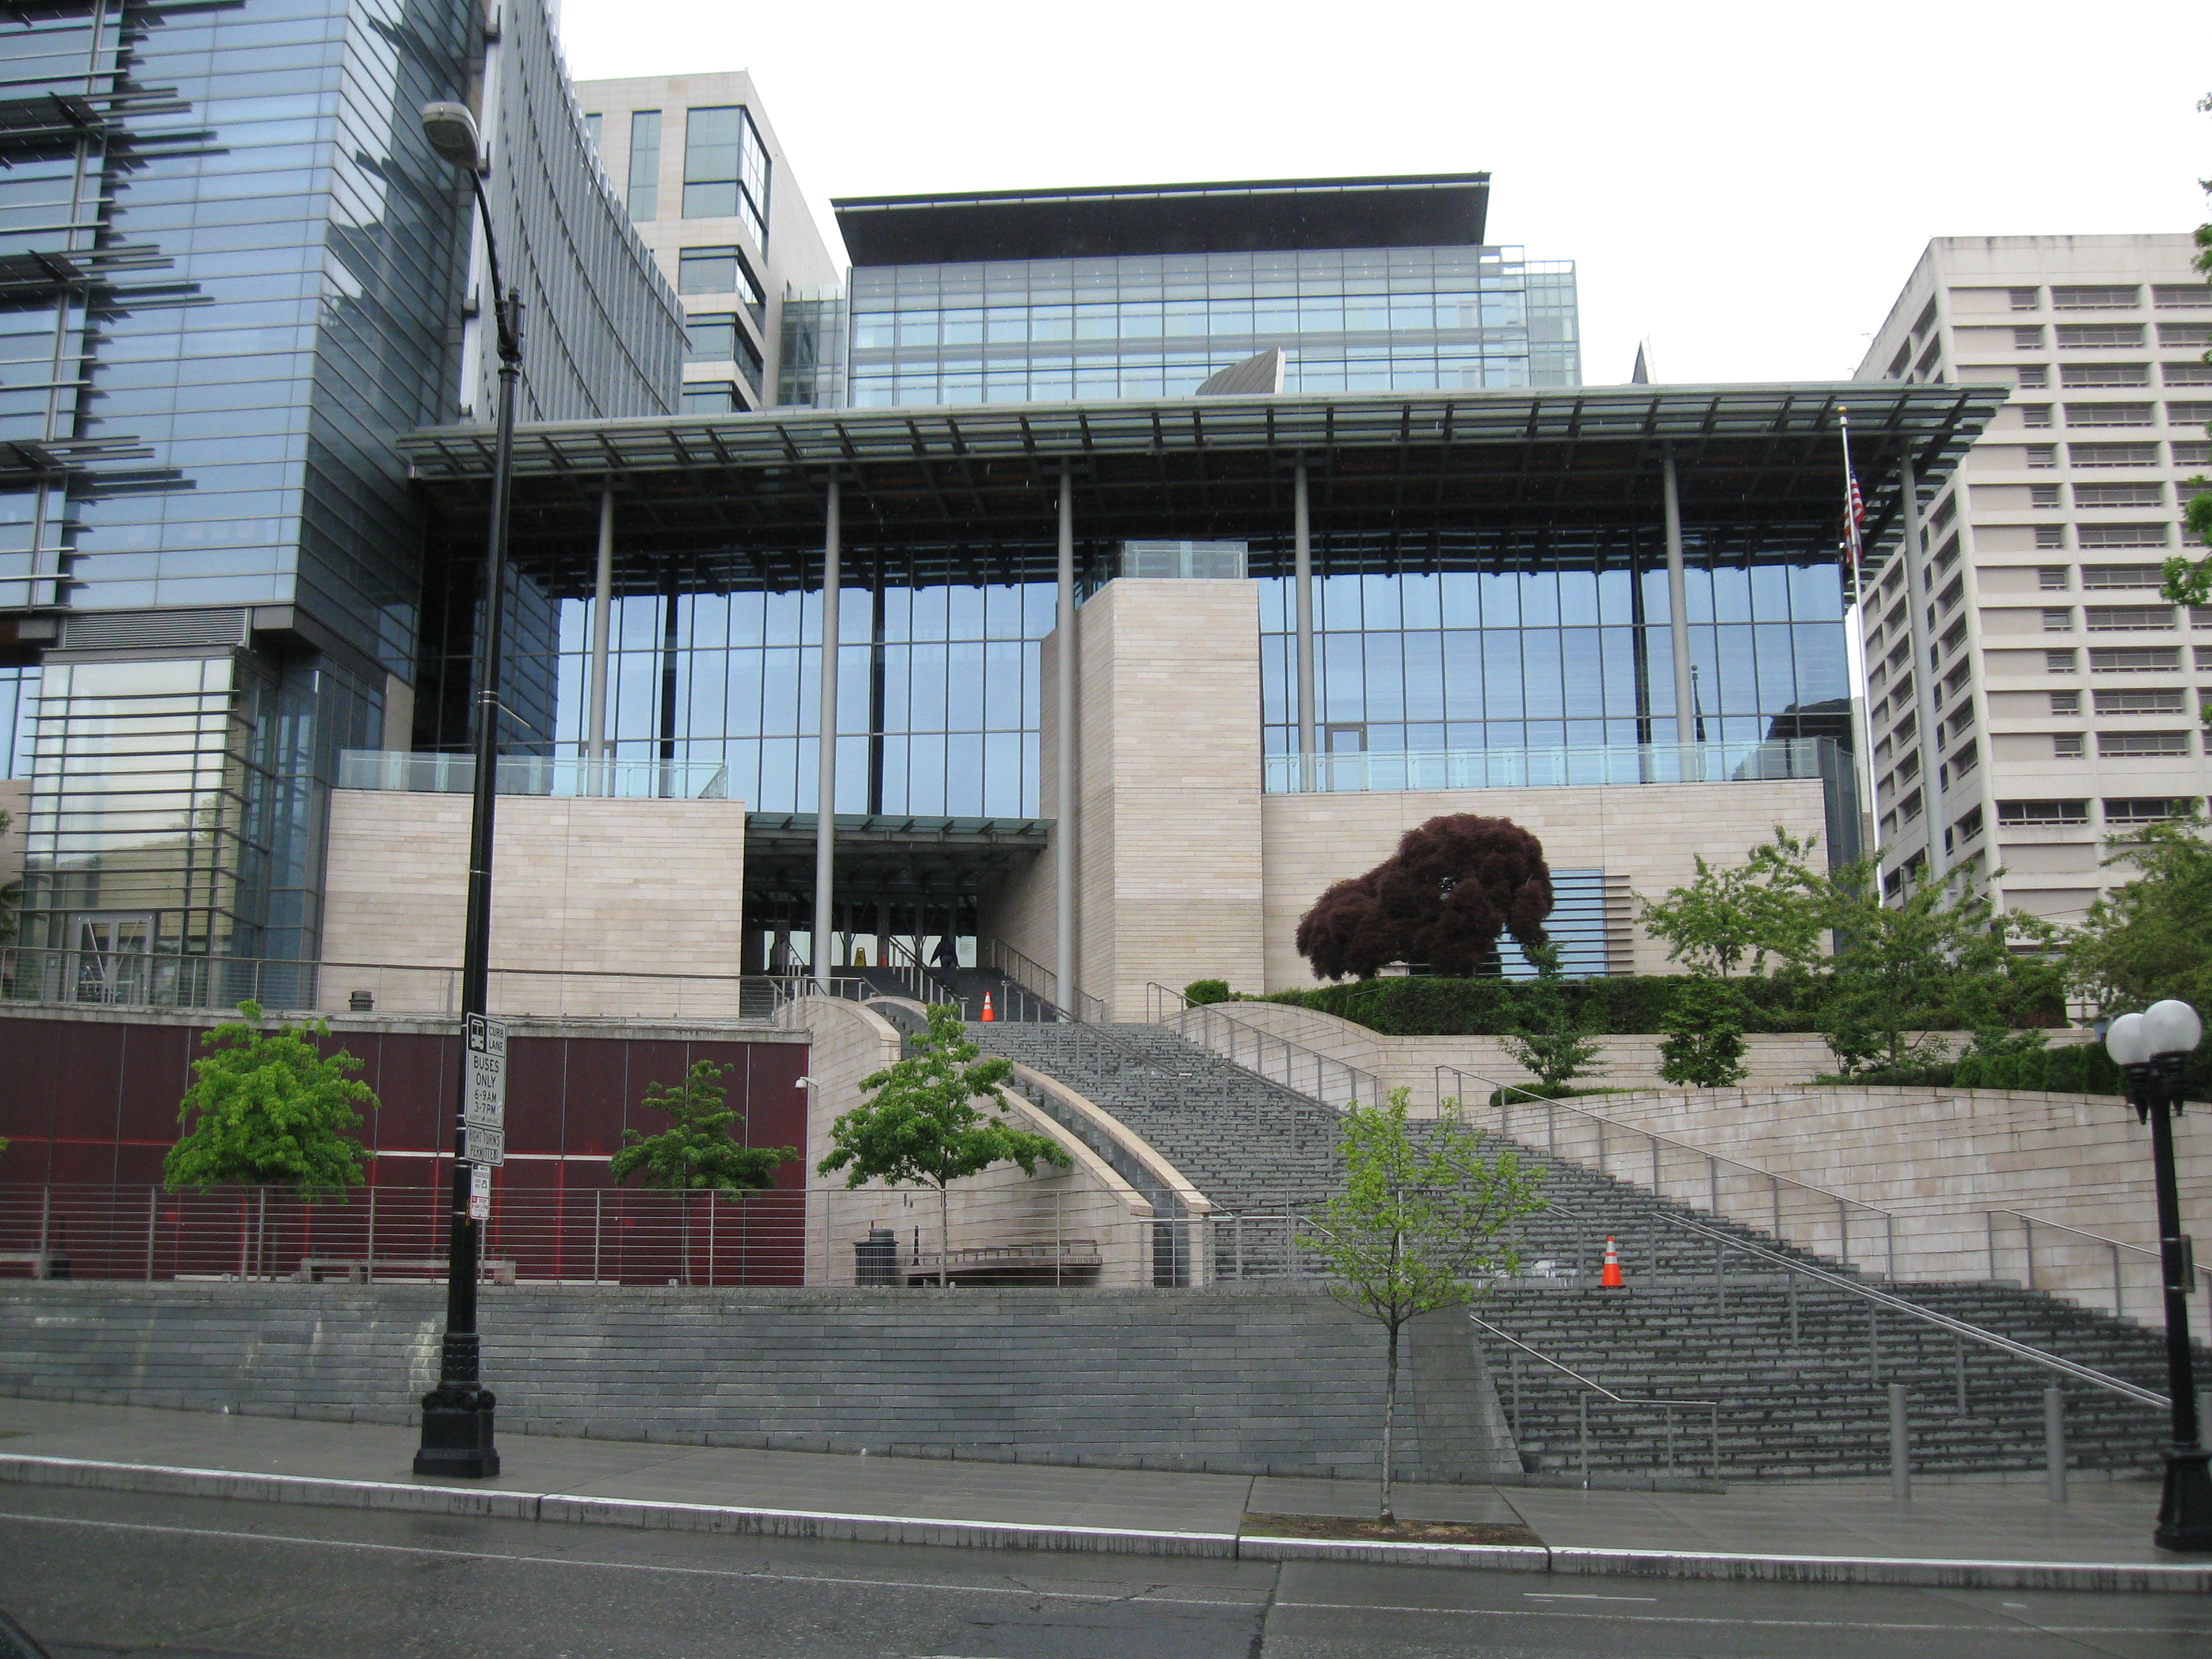 https://upload.wikimedia.org/wikipedia/commons/e/e7/Seattle_City_Hall_001.jpg